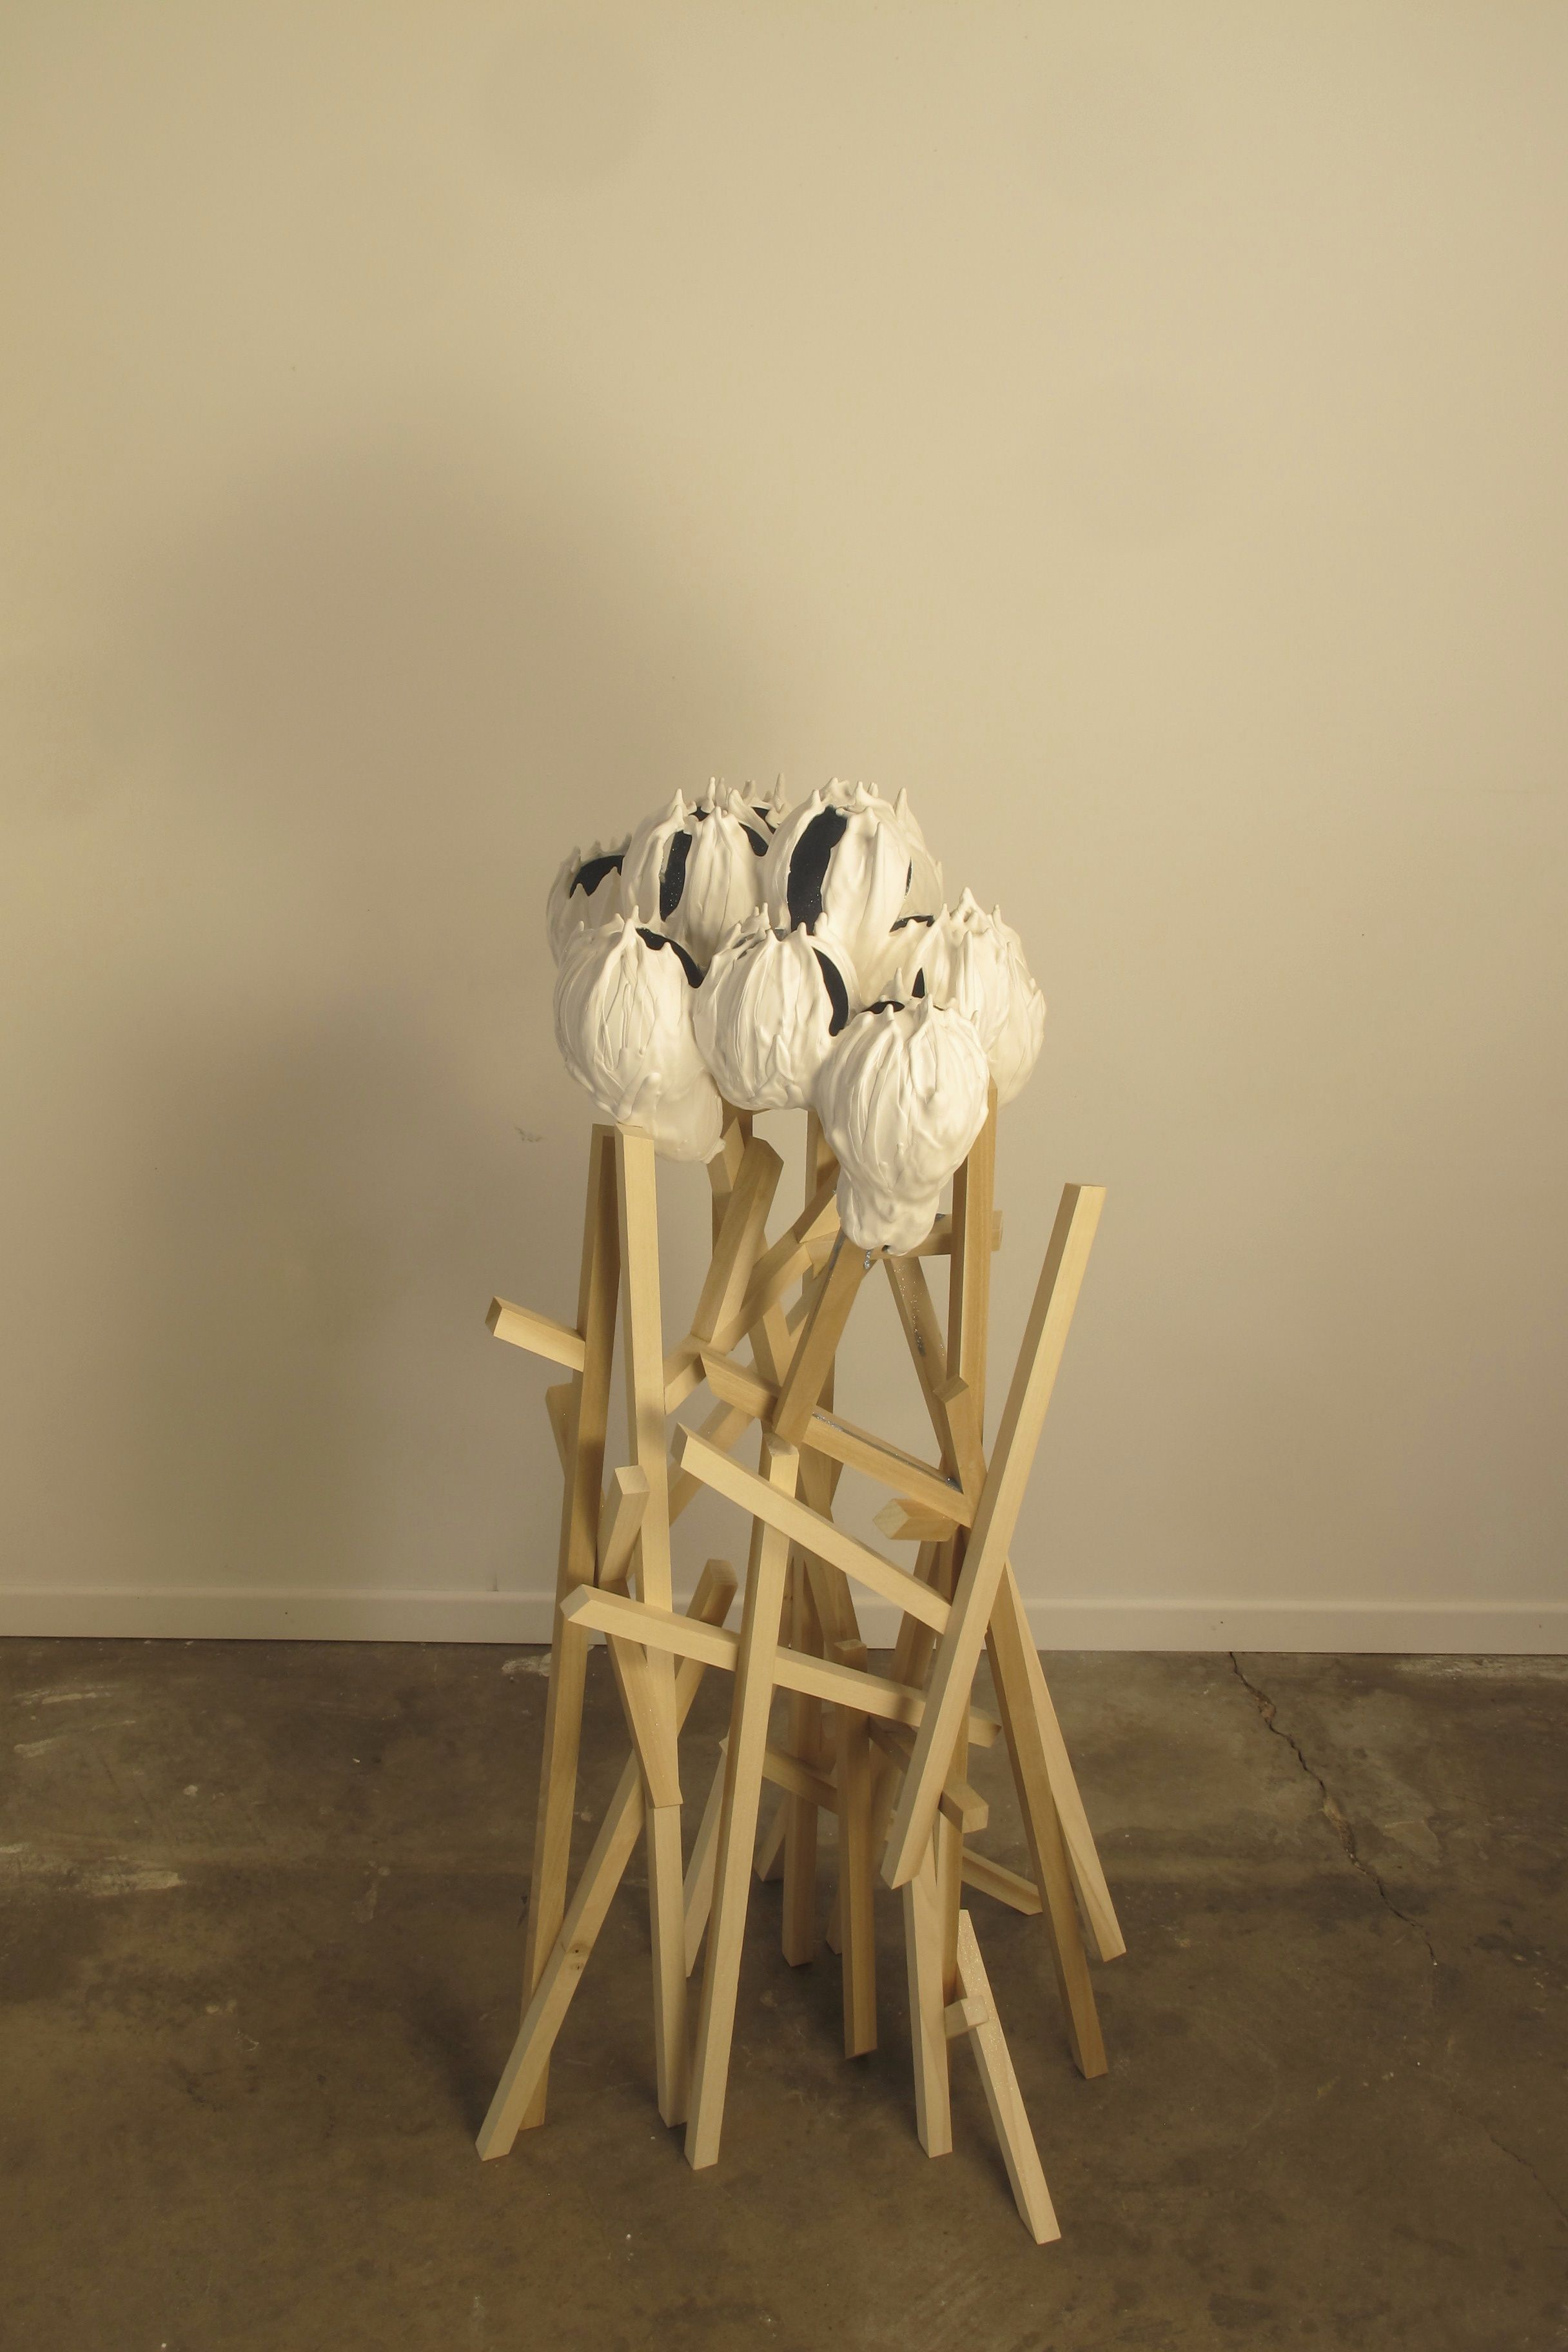 """Colony"", hydro-stone, glitter, wood, 2013 #sculpture #plaster #glitter #art #wood #mitrafabian"